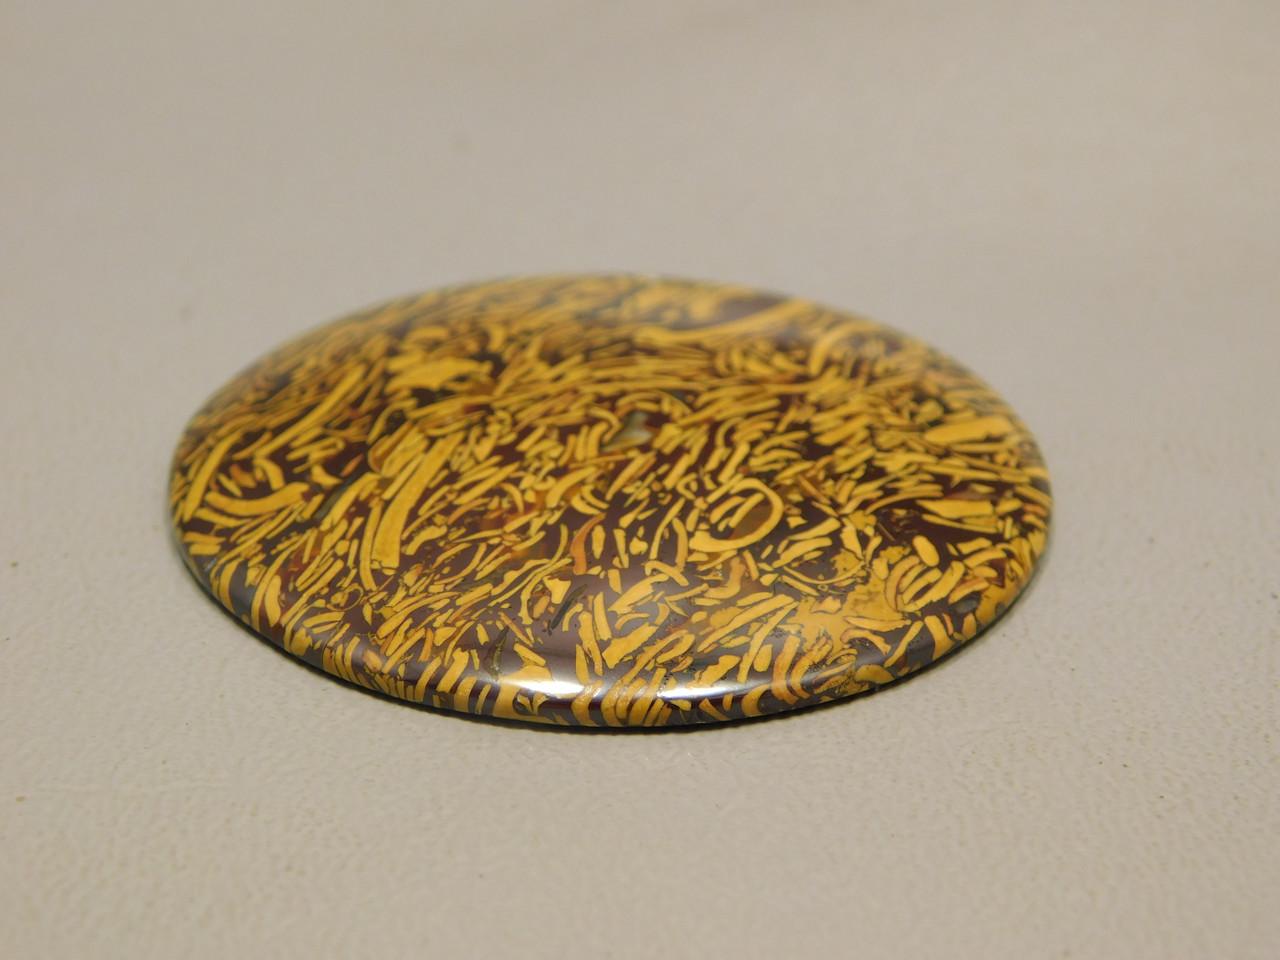 Cabochon Coquina Jasper Stone 45 mm Round Fossil  2